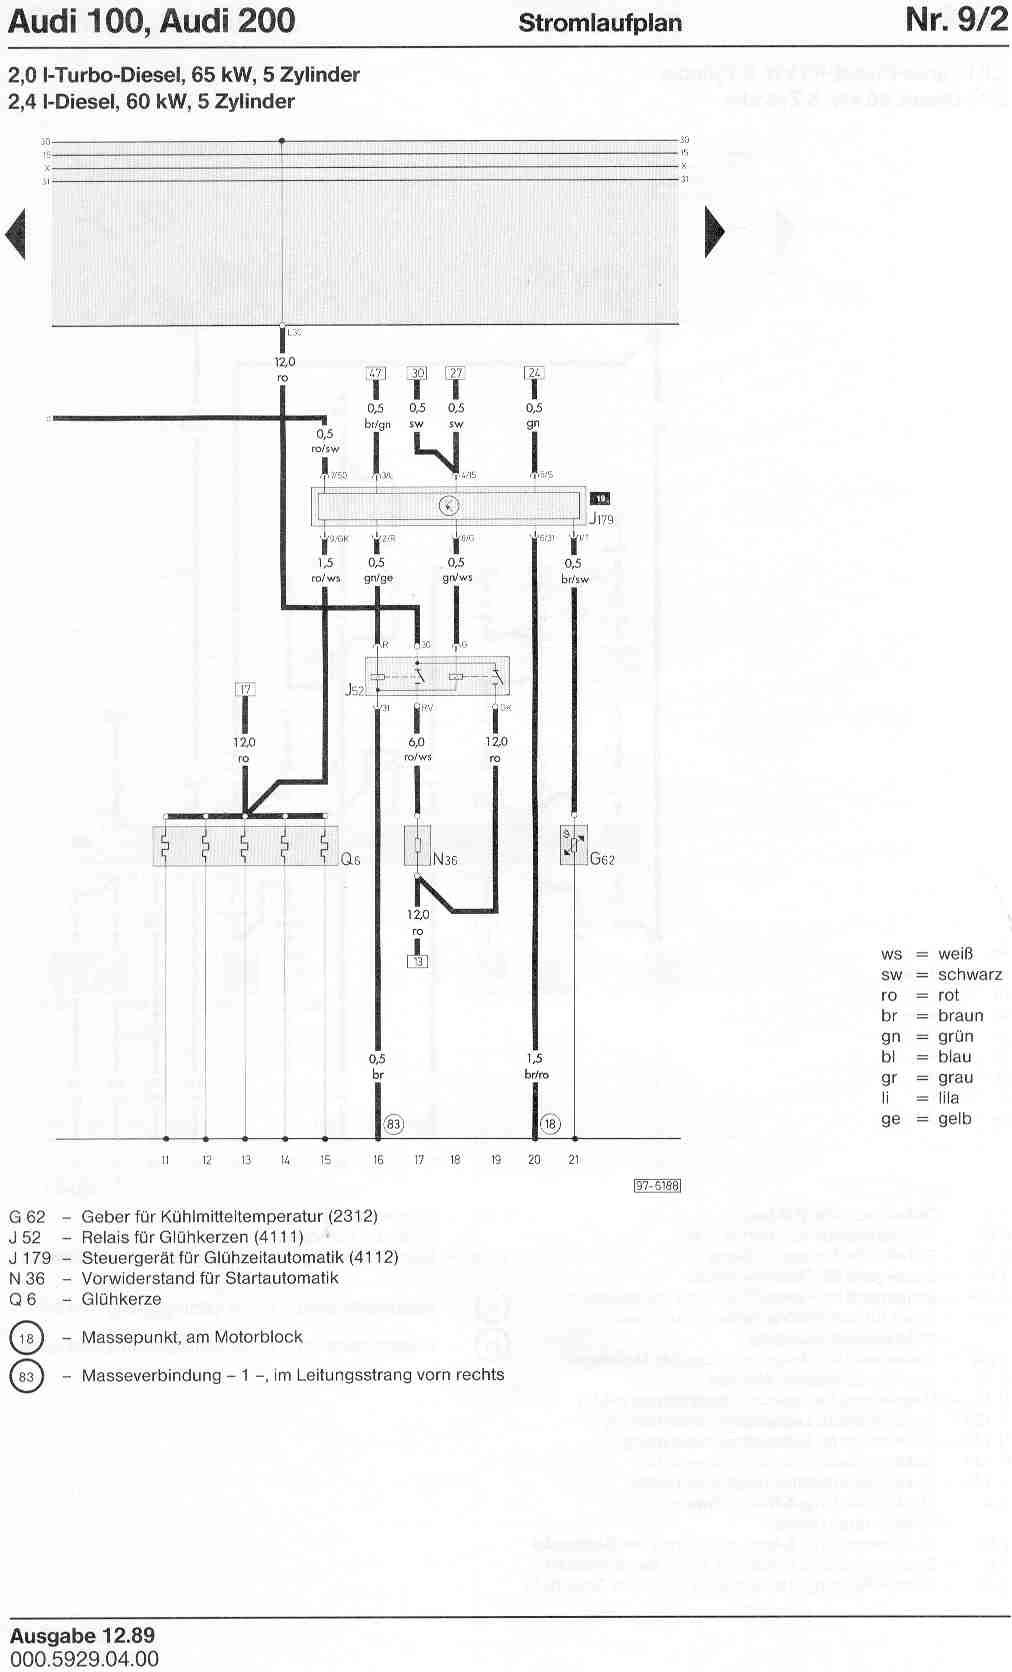 Audi 100 200 Factory Wiring Diagrams 20v W Diesel Engine Diagram Page 1 2